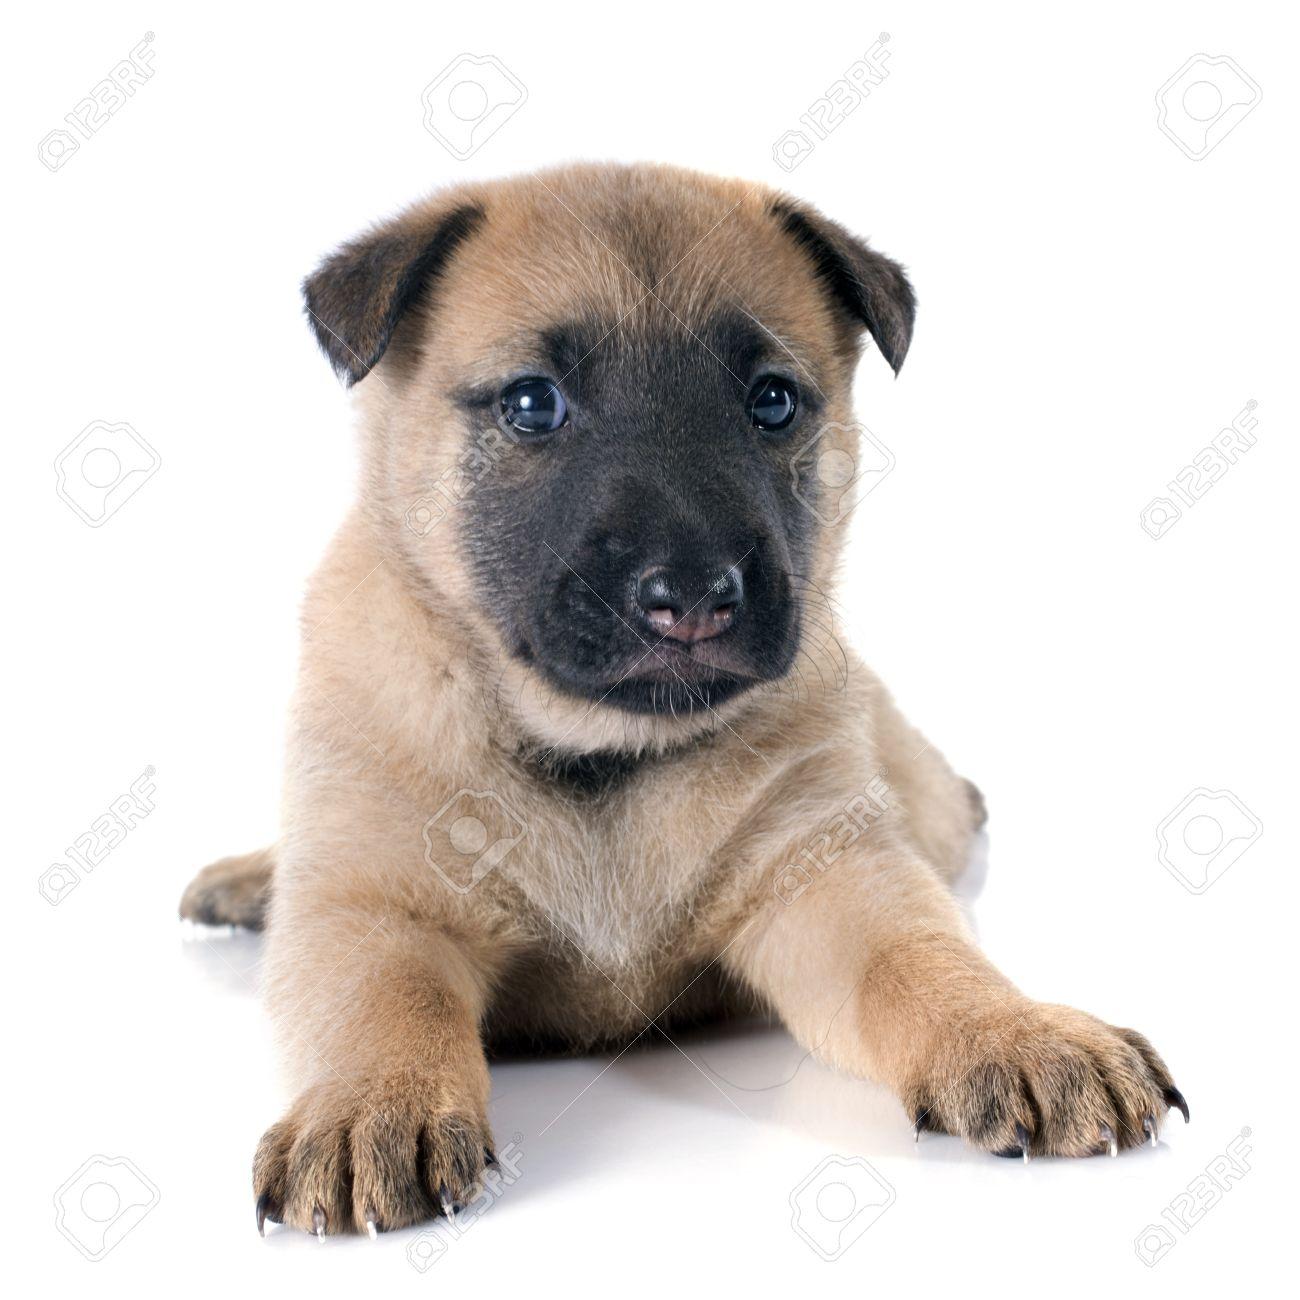 29244319-cachorro-perro-pastor-belga-malinois-en-un-fondo-blanco-Foto-de-archivo